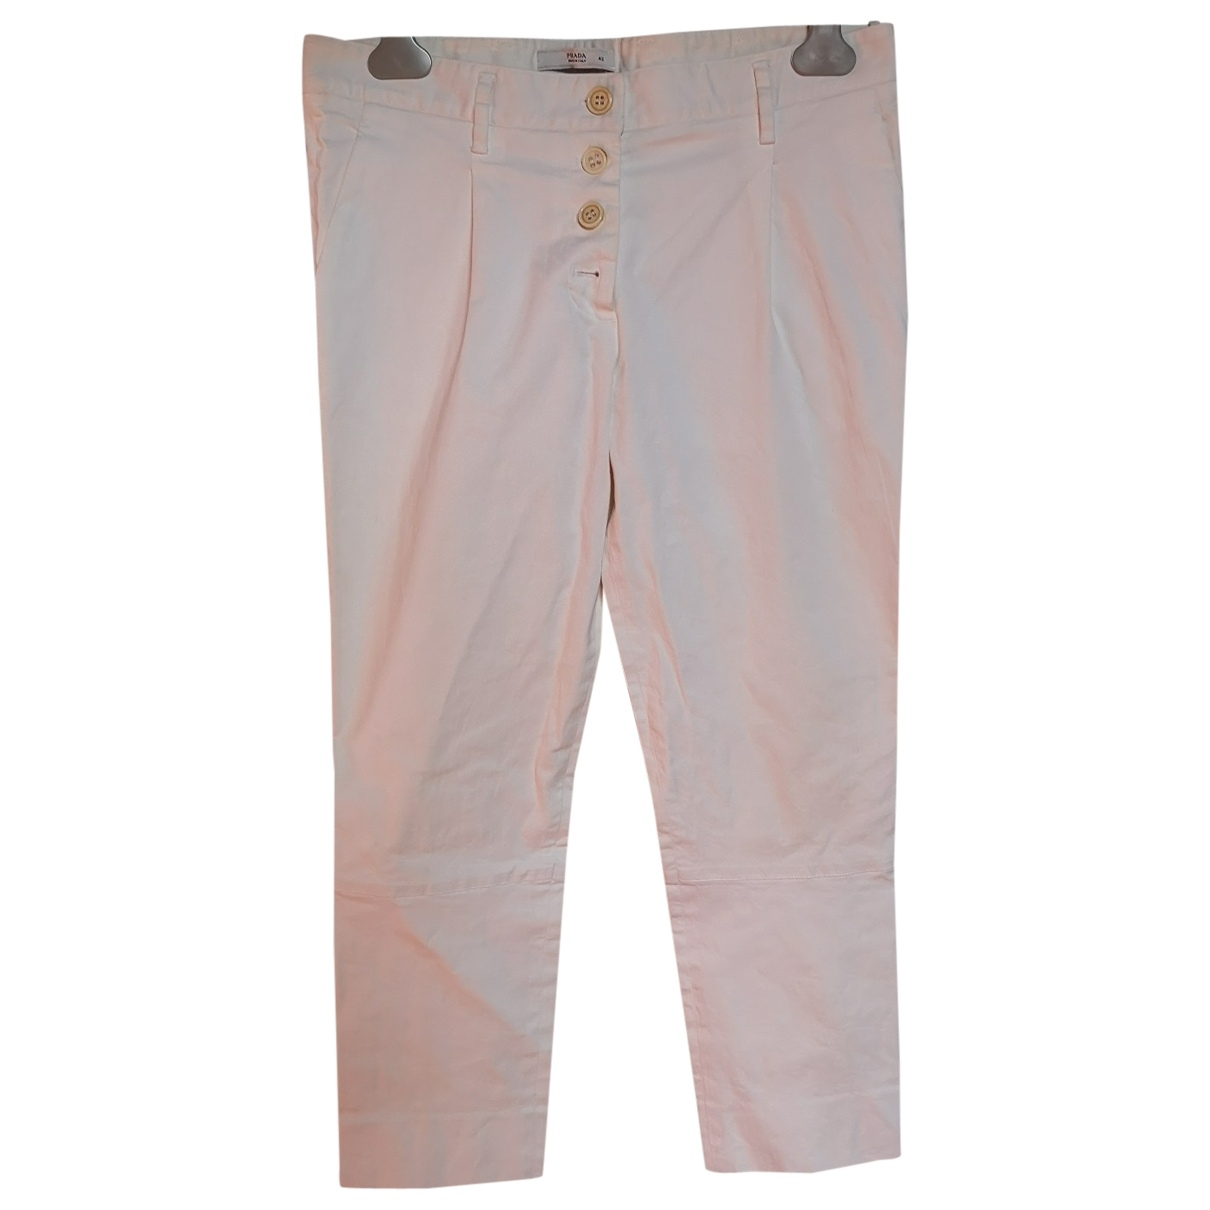 Prada \N White Cotton Trousers for Women 44 IT